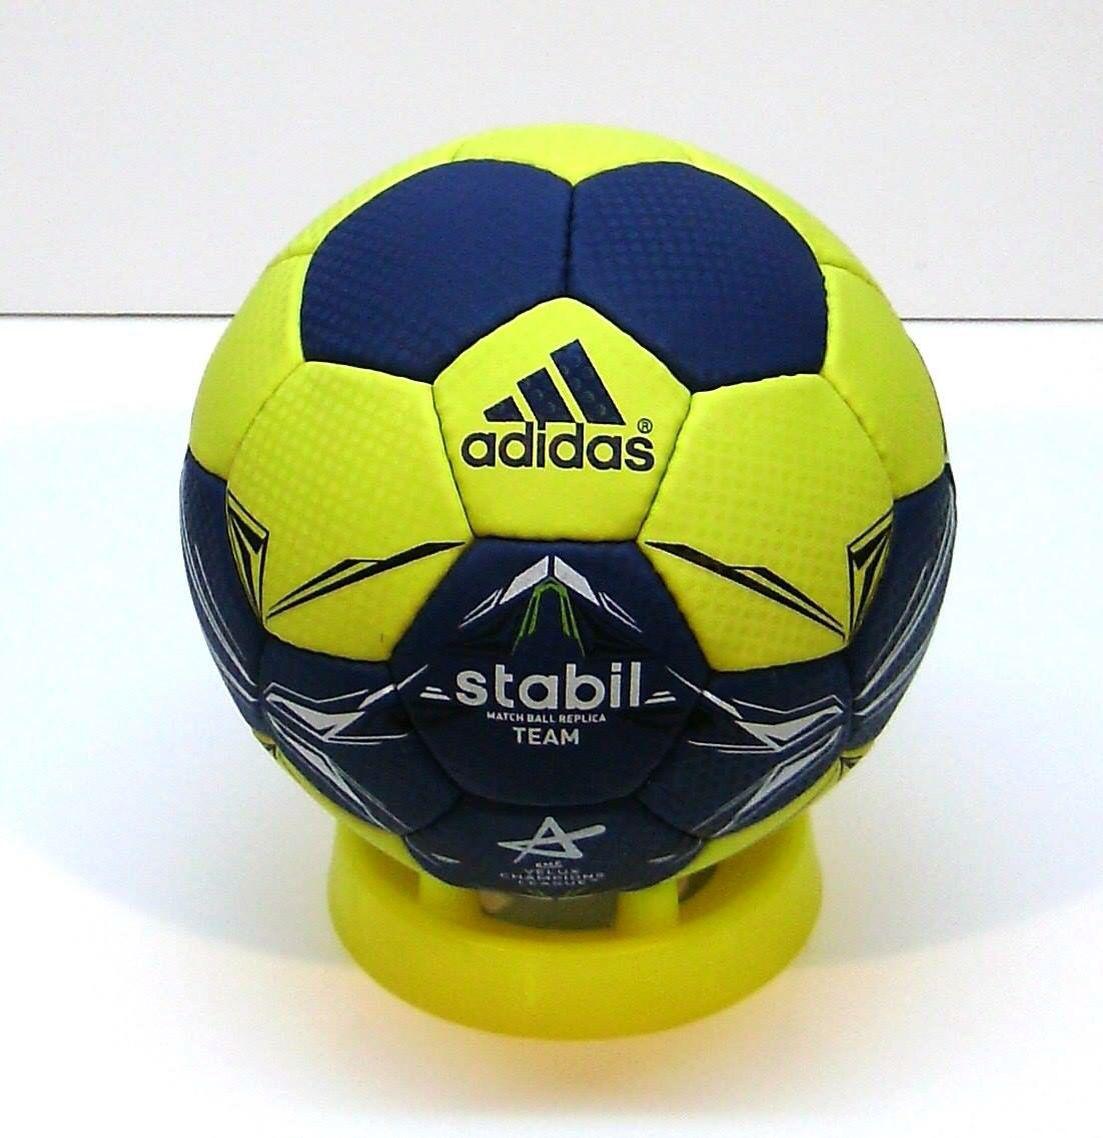 Stabil Adidas   Handball   Pinterest   Stabil und Adidas